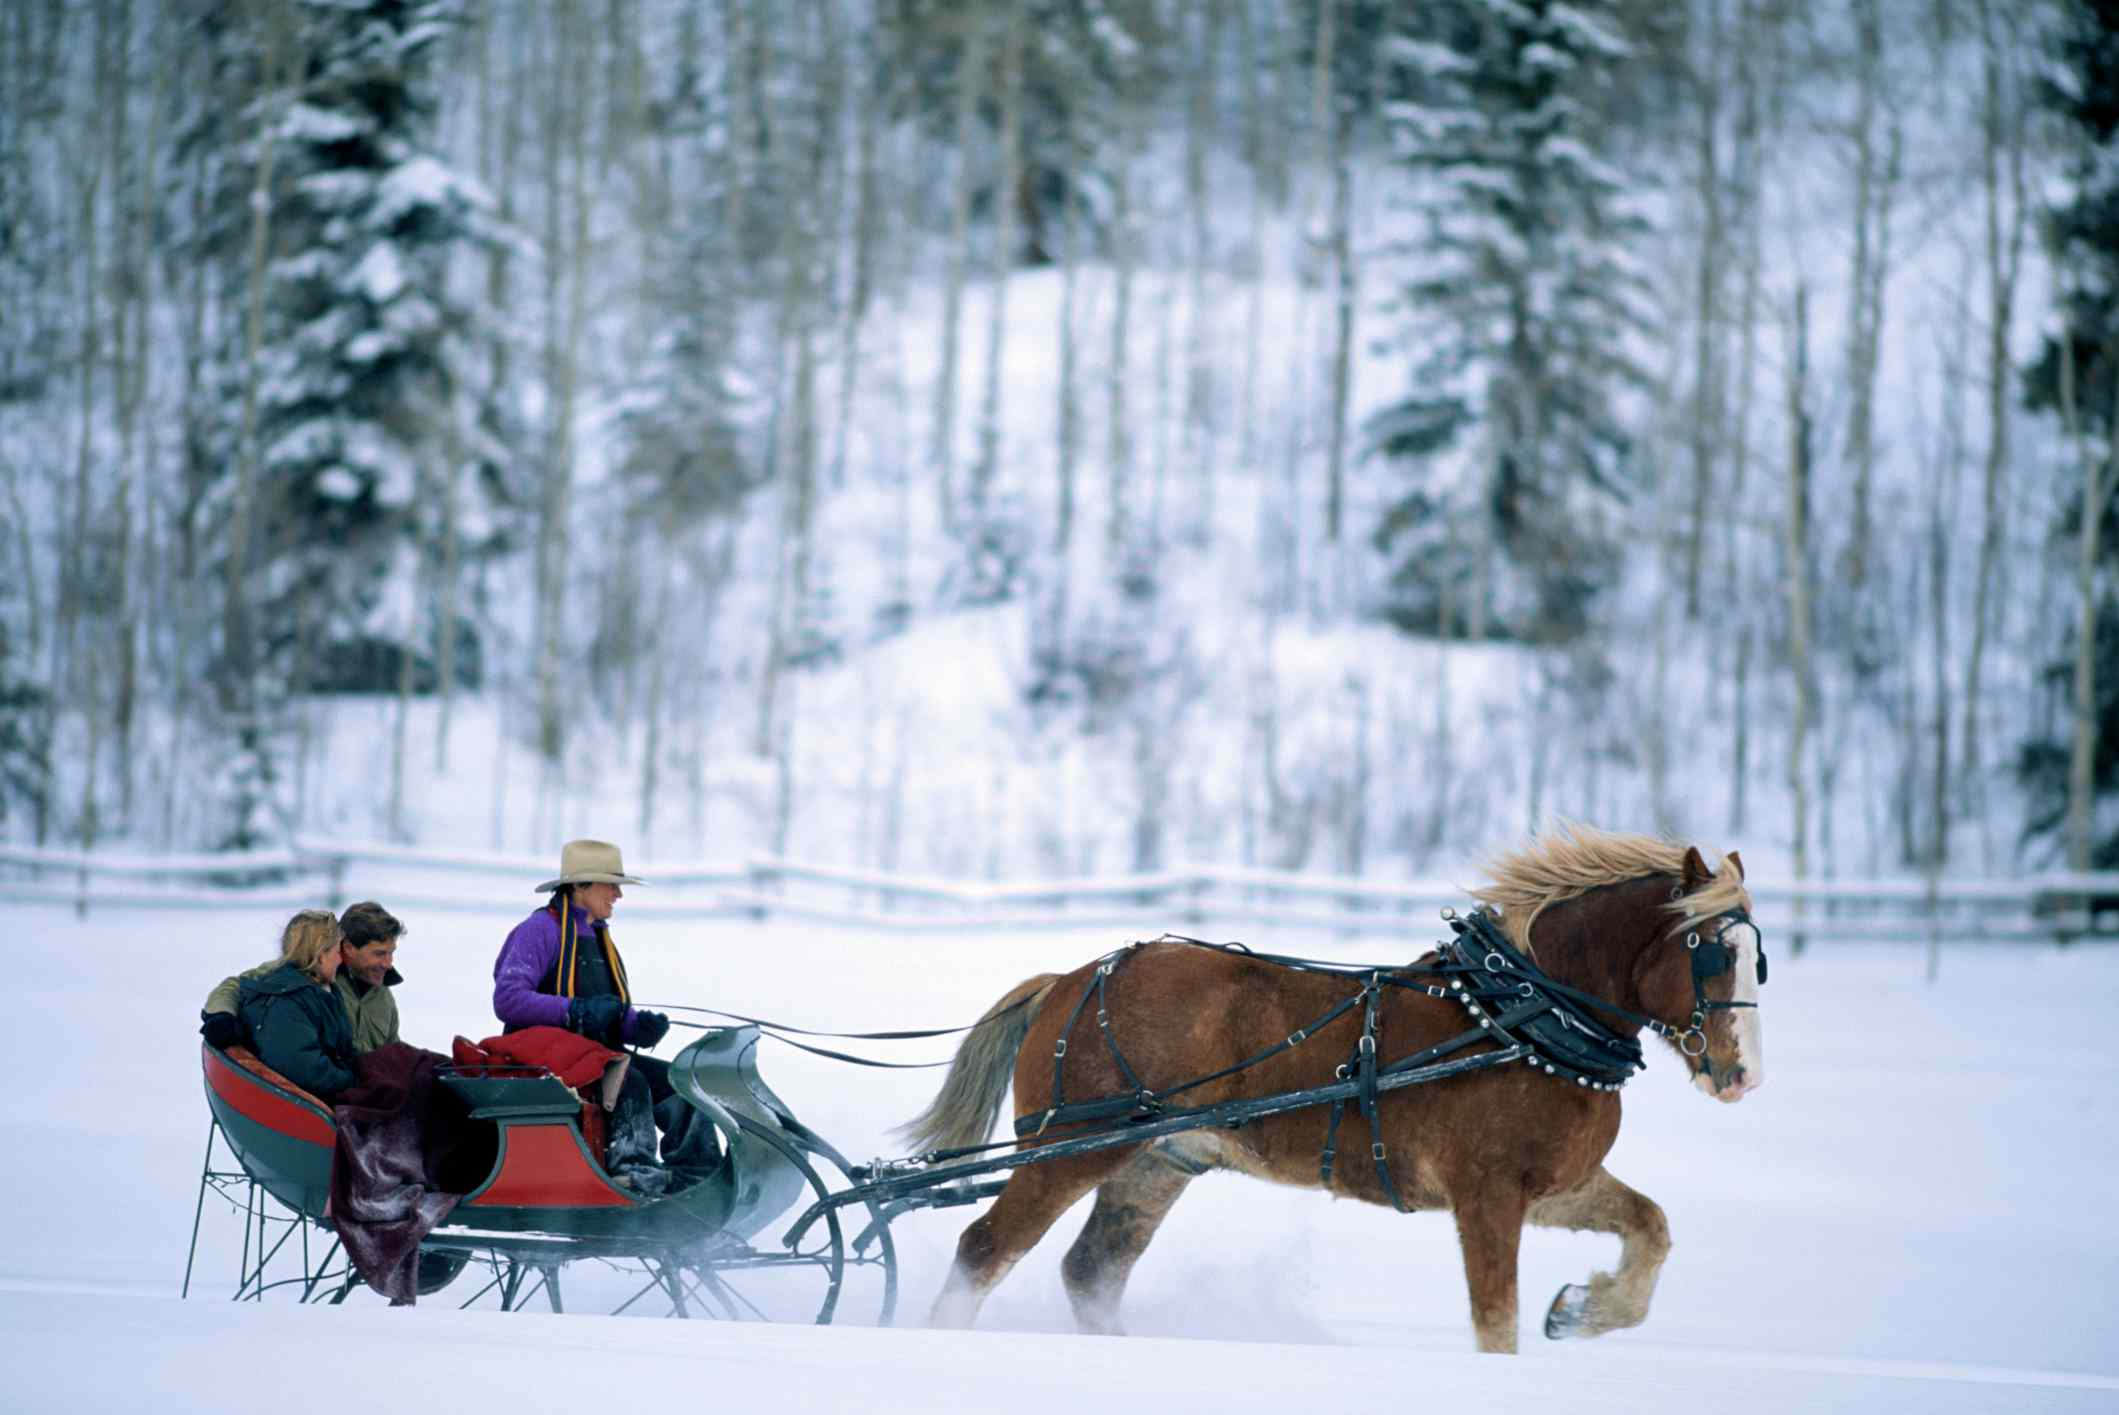 Family taking a horse-drawn sleigh ride